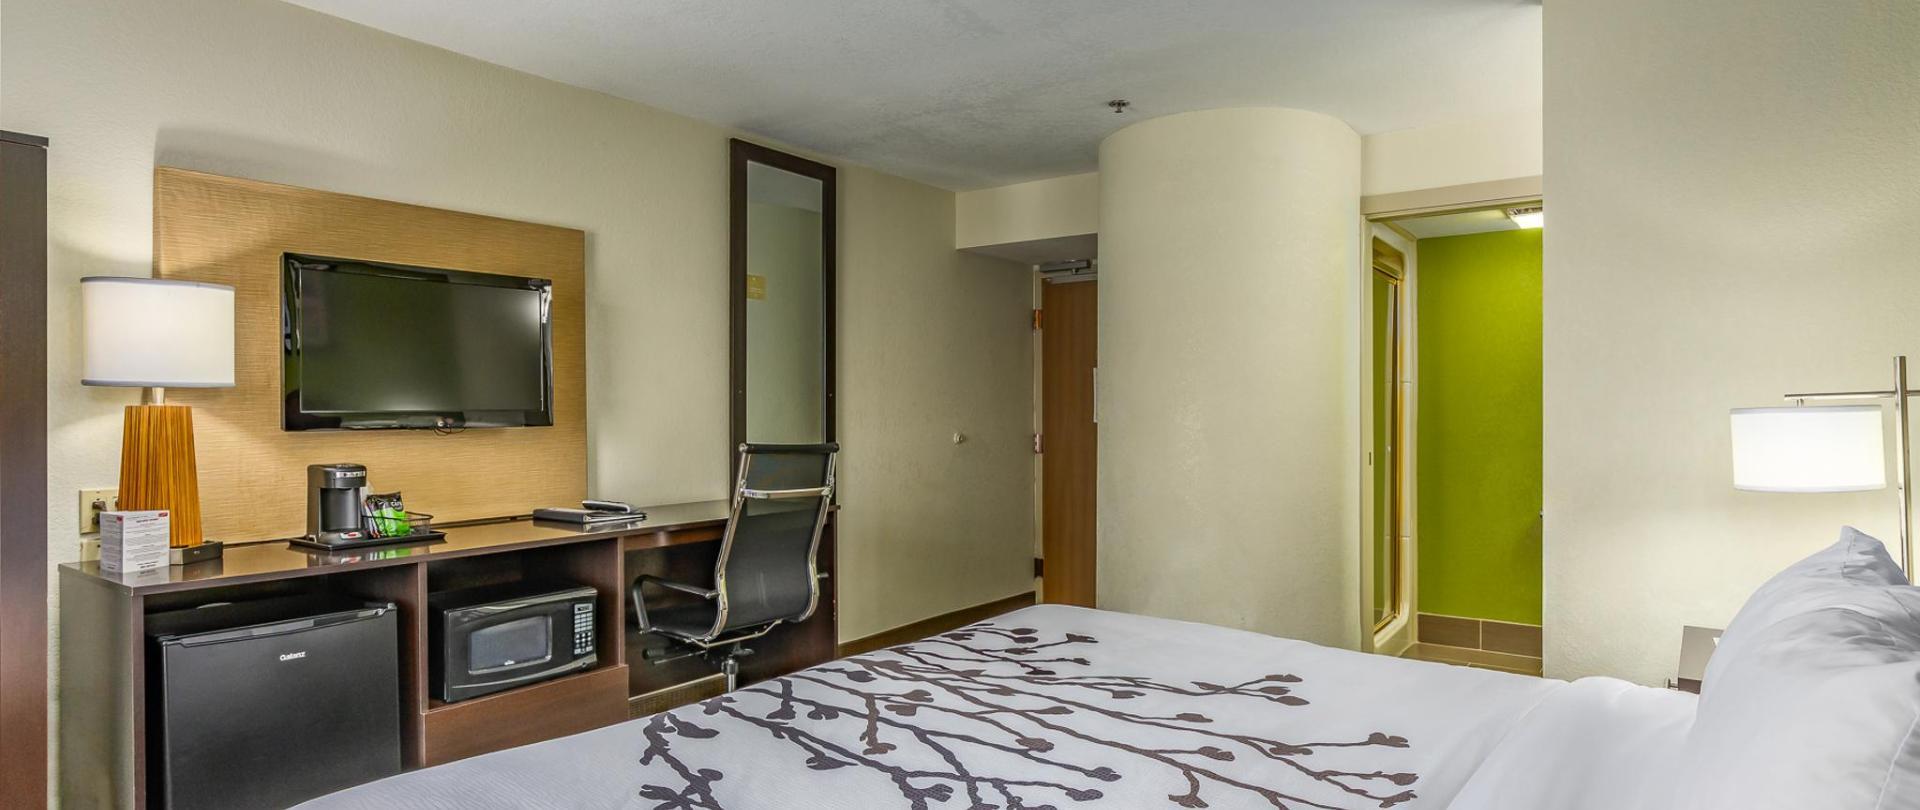 Room 314-3.jpg